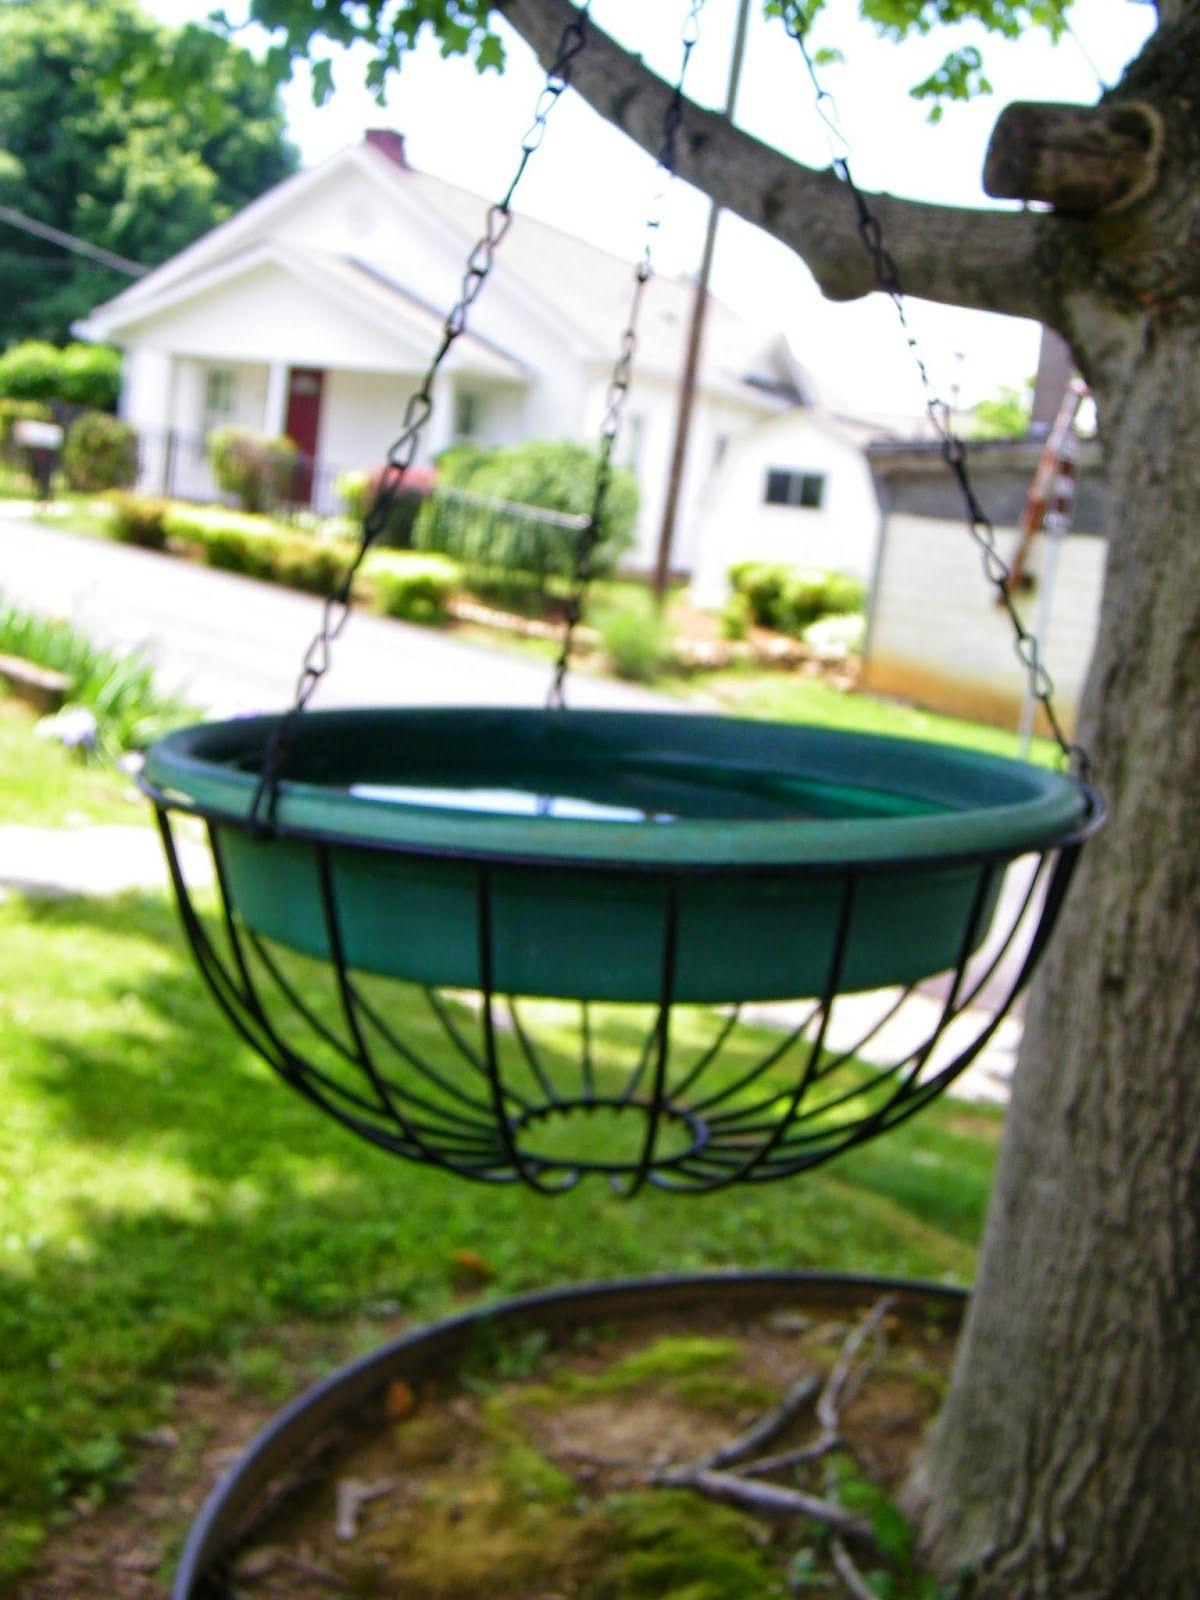 Diy Bird Bath Ideas Tend To Try And Use What I Already Have On Hand When Hanging Bird Bath Diy Bird Bath Bird Bath Garden